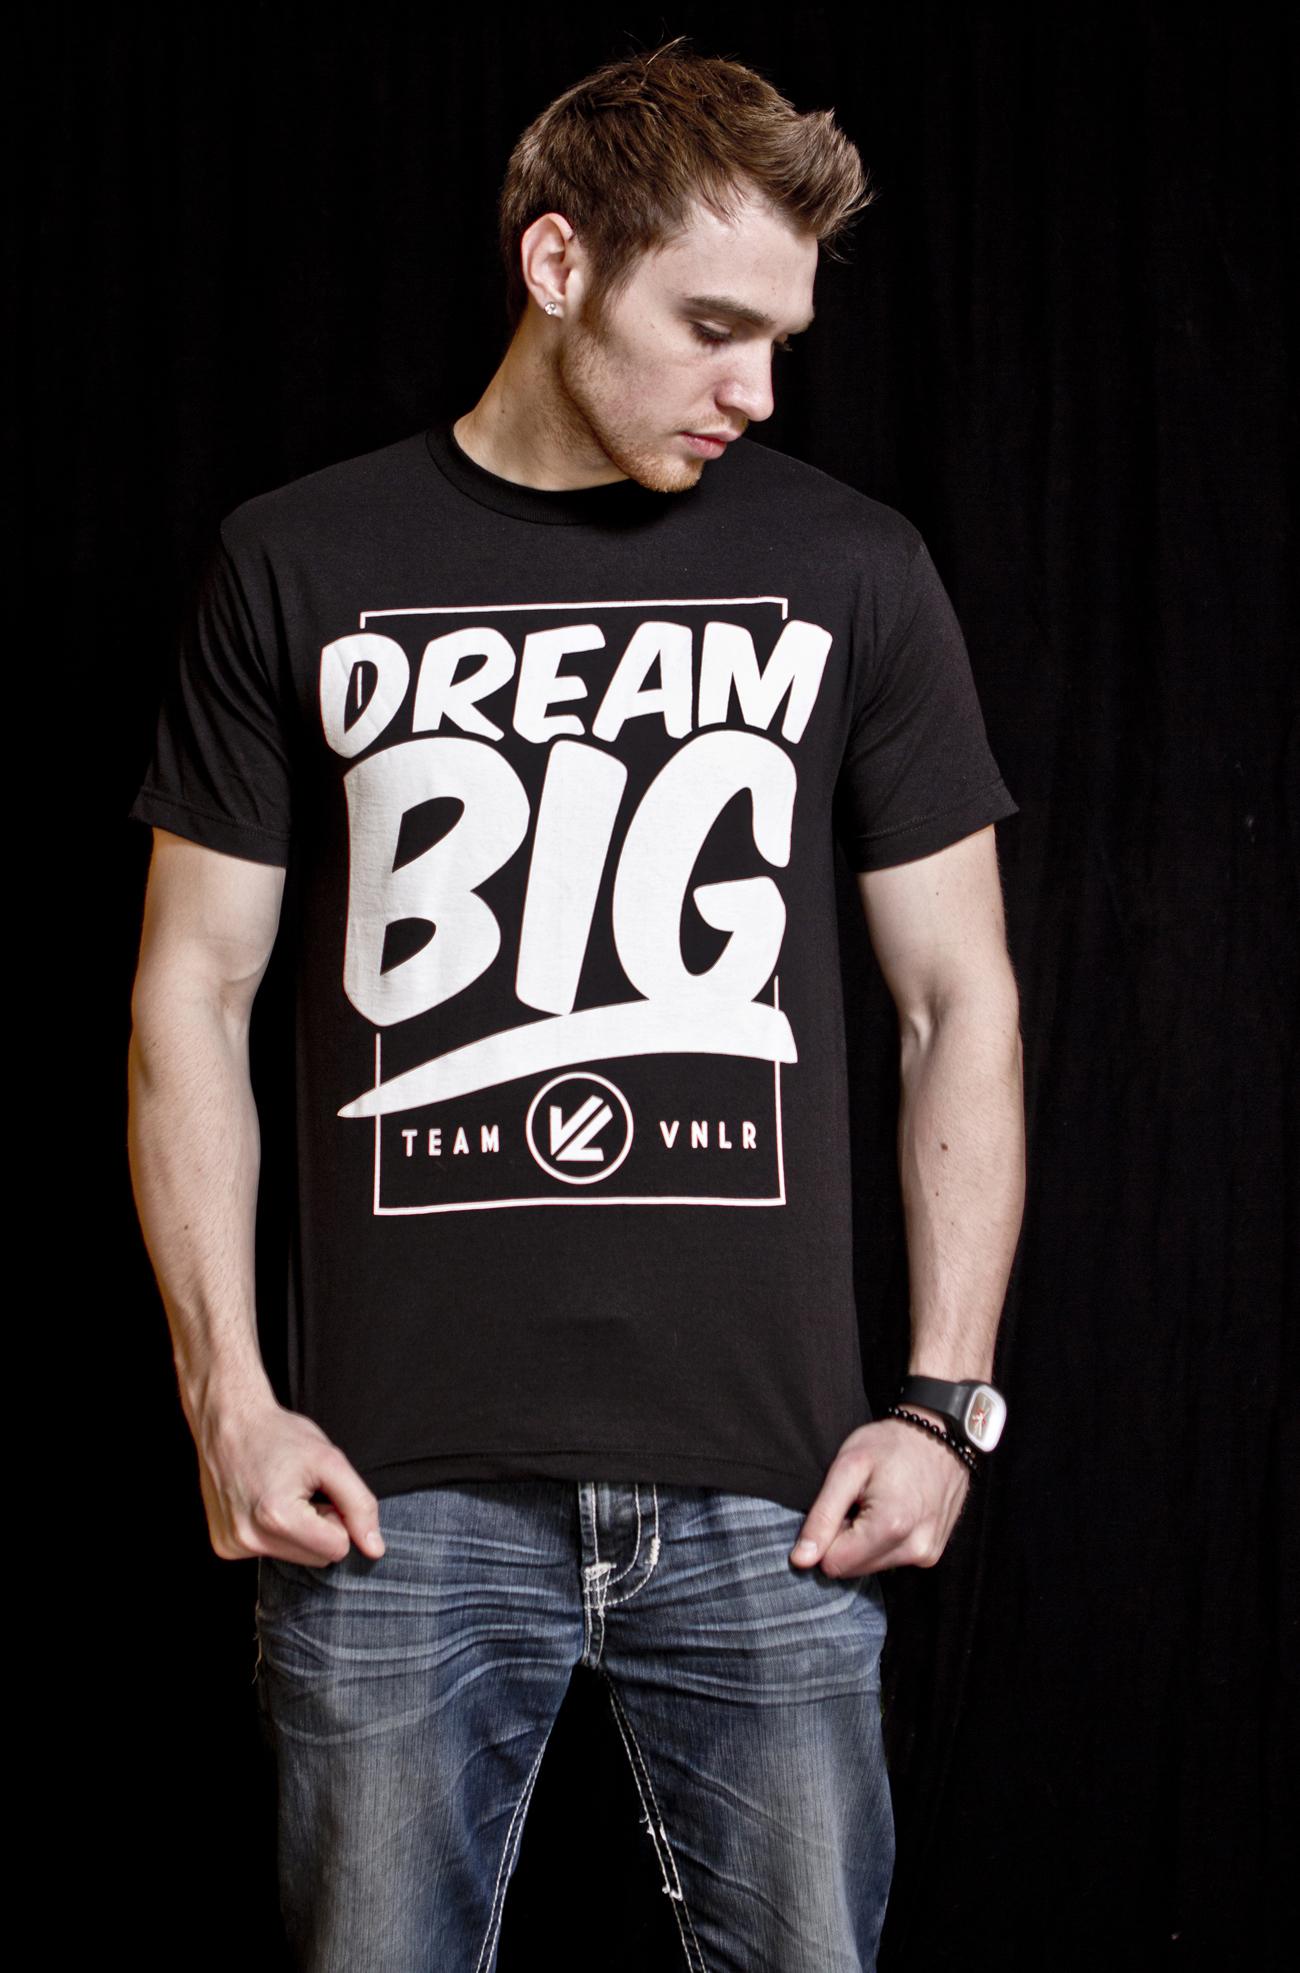 DREAM BIG HIM 1 LR.jpg